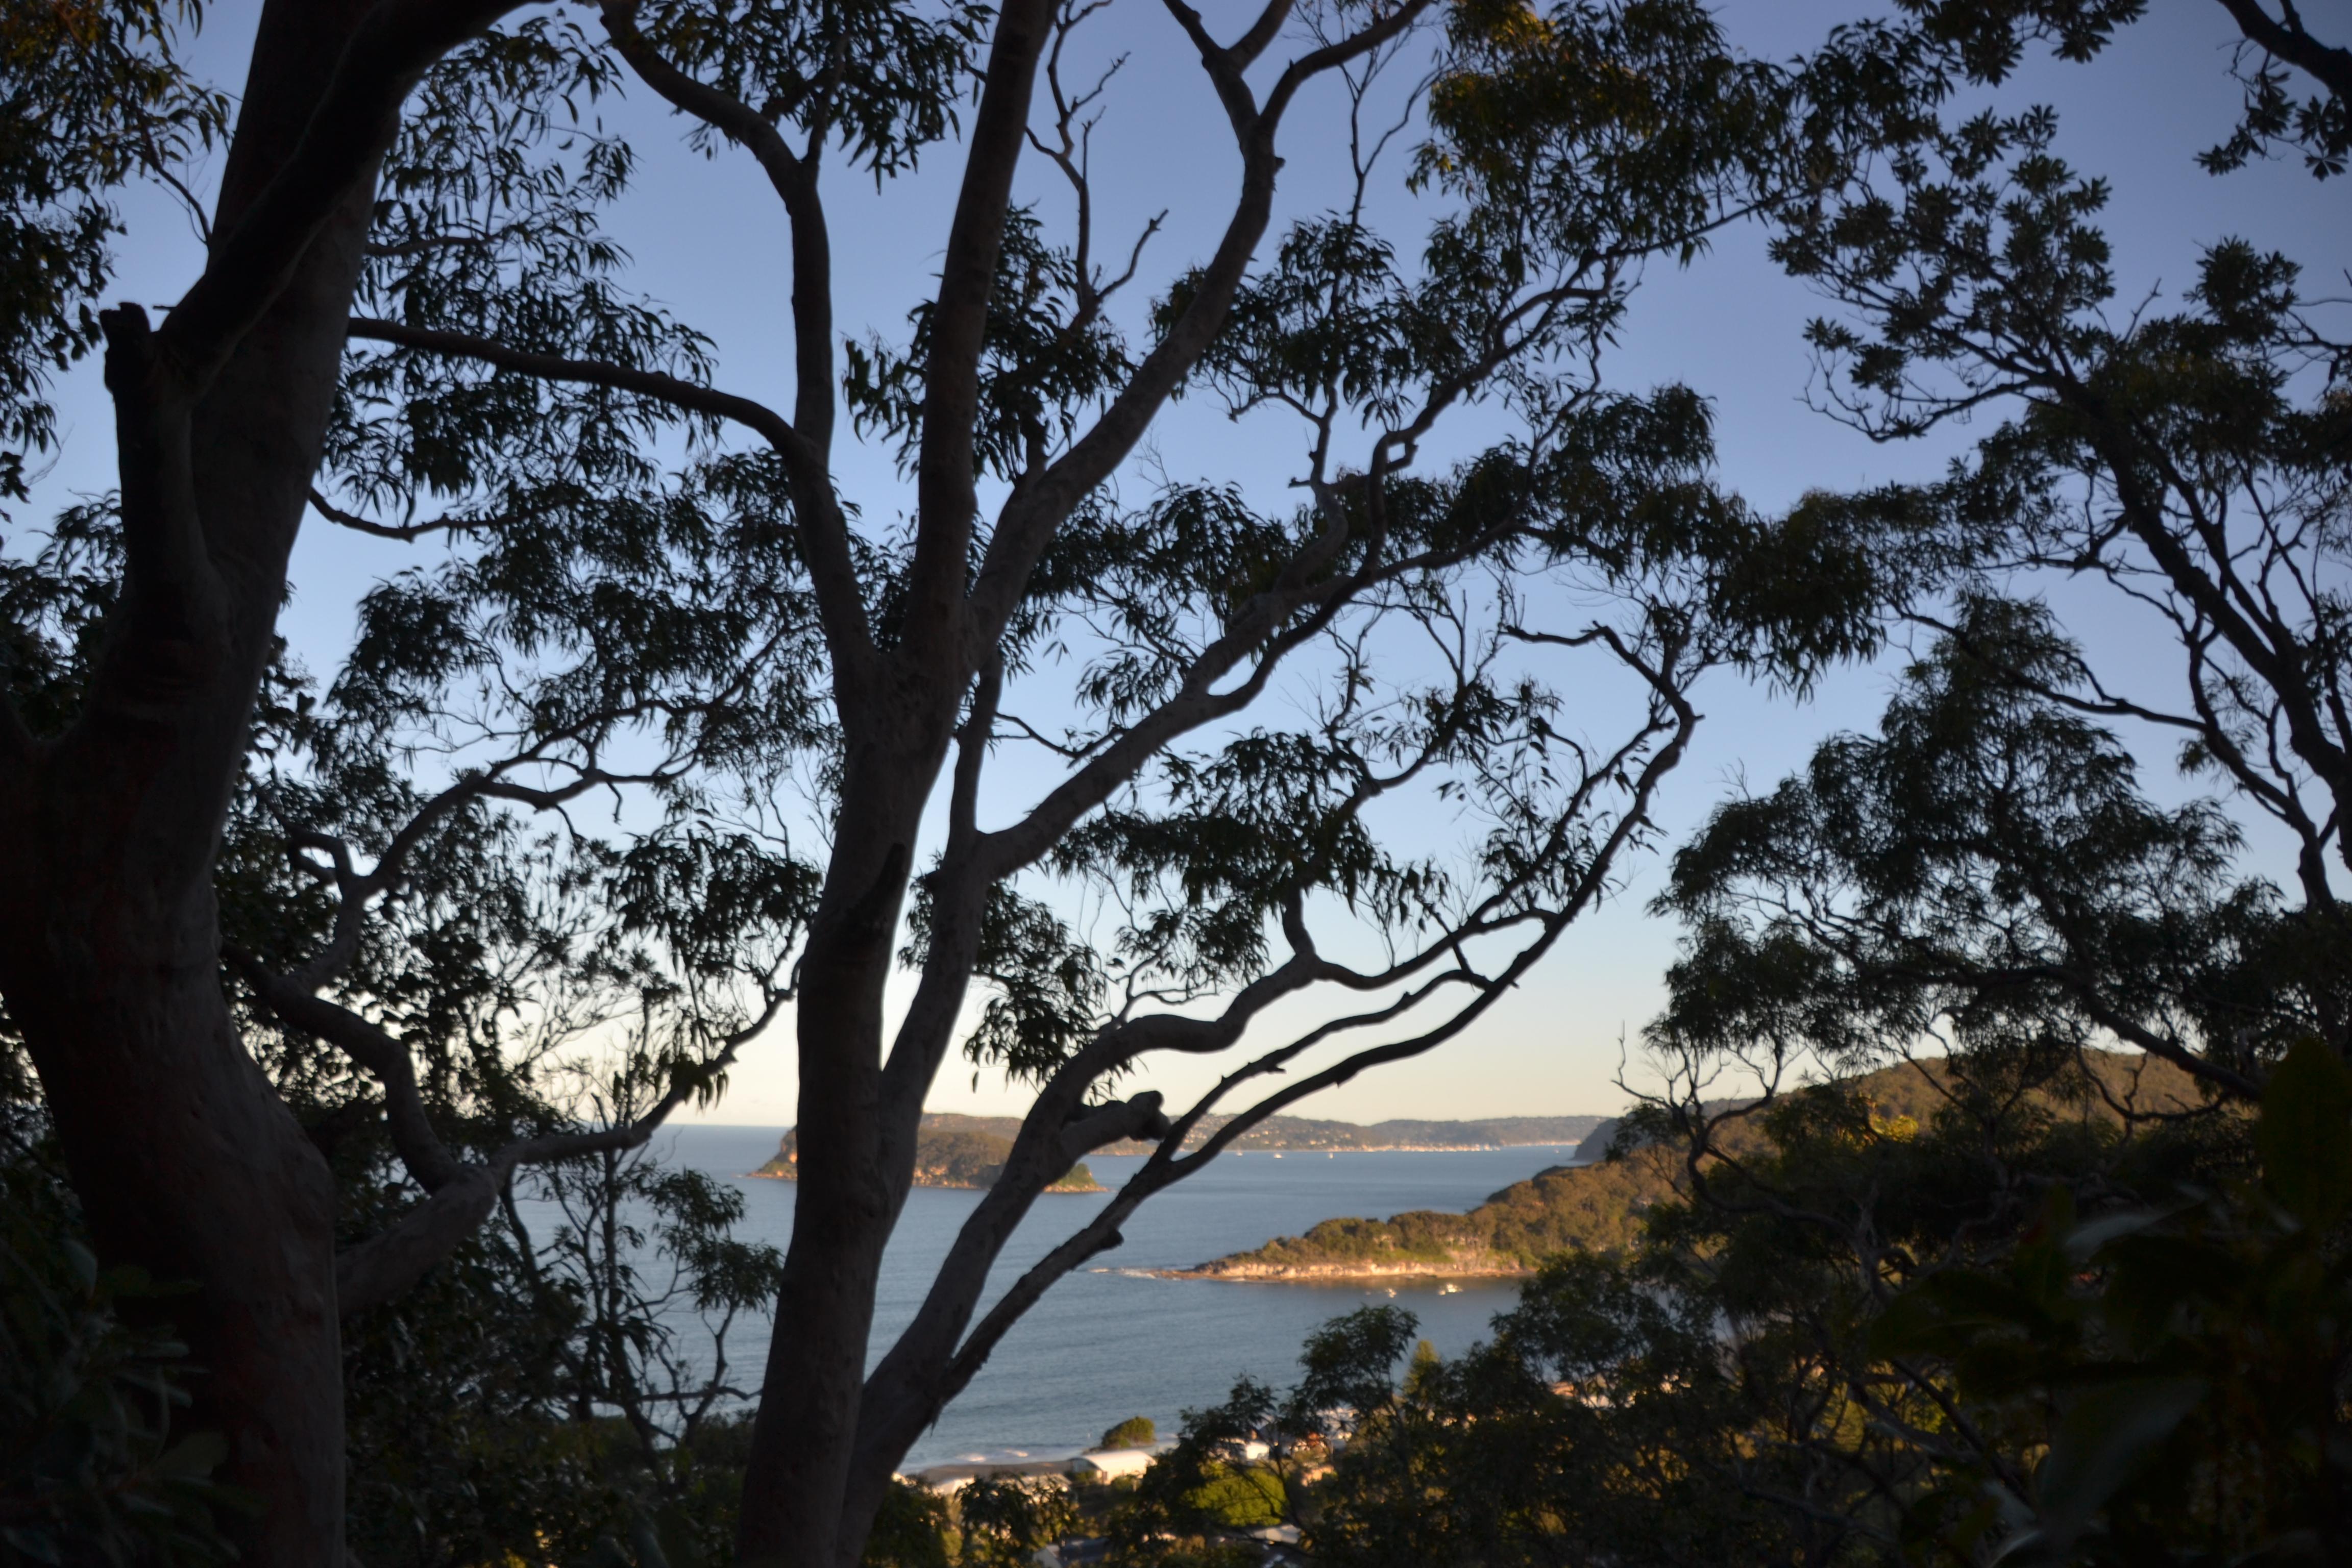 Mt Ettalong Lookout through trees